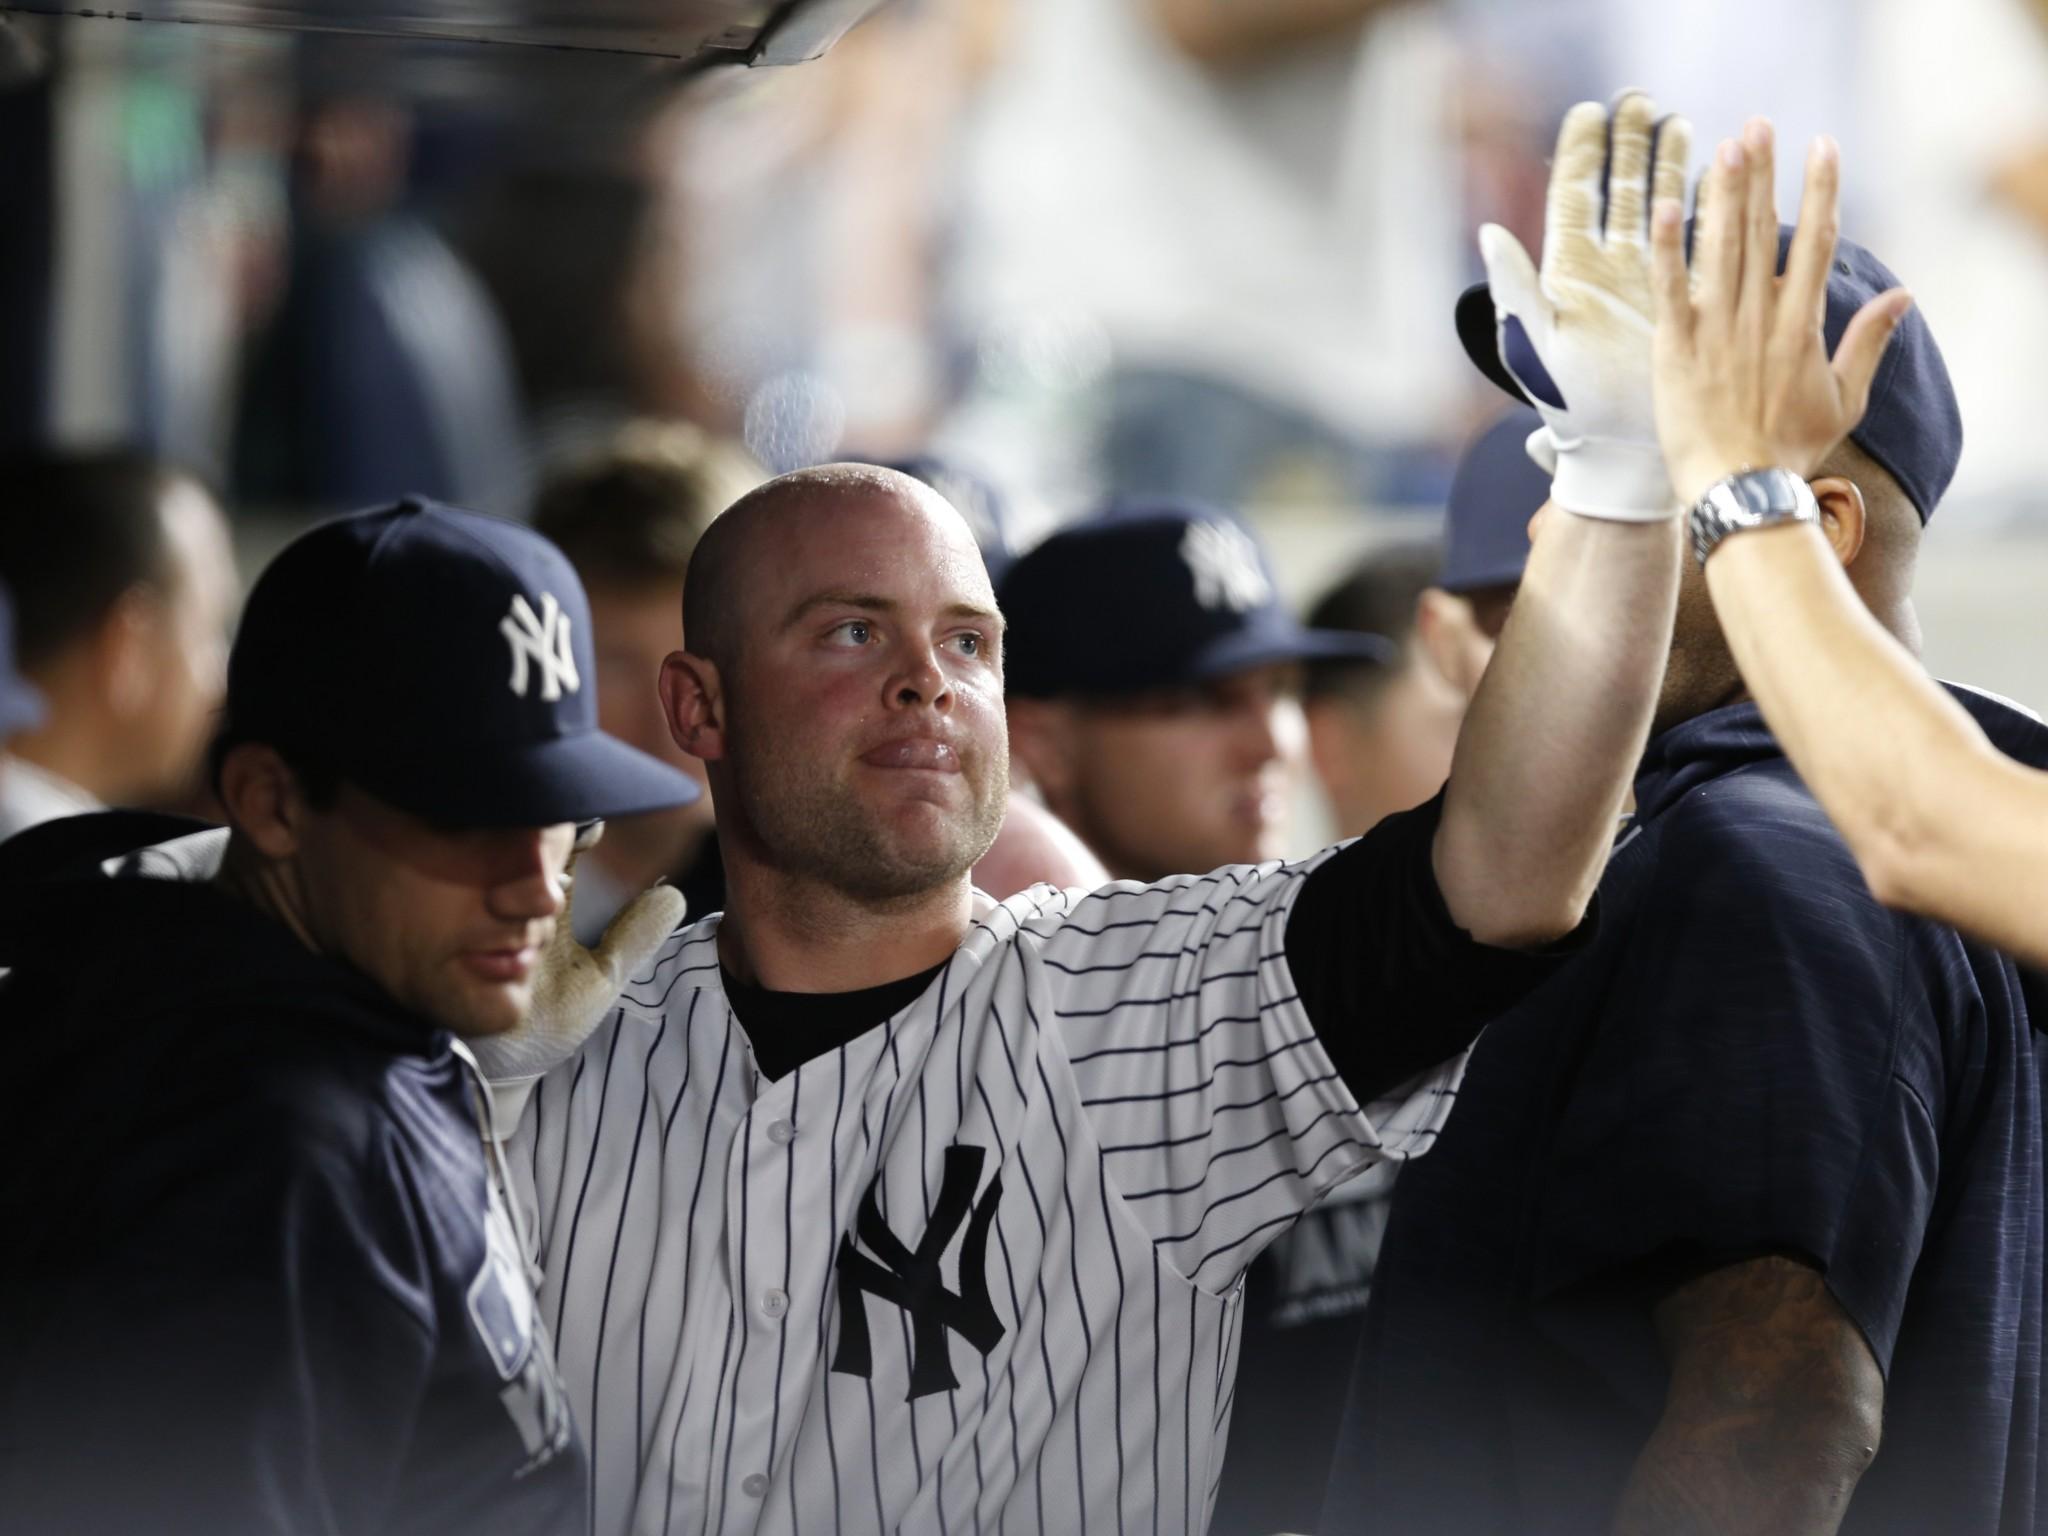 After unloading McCann, Yankees should reload with Beltran